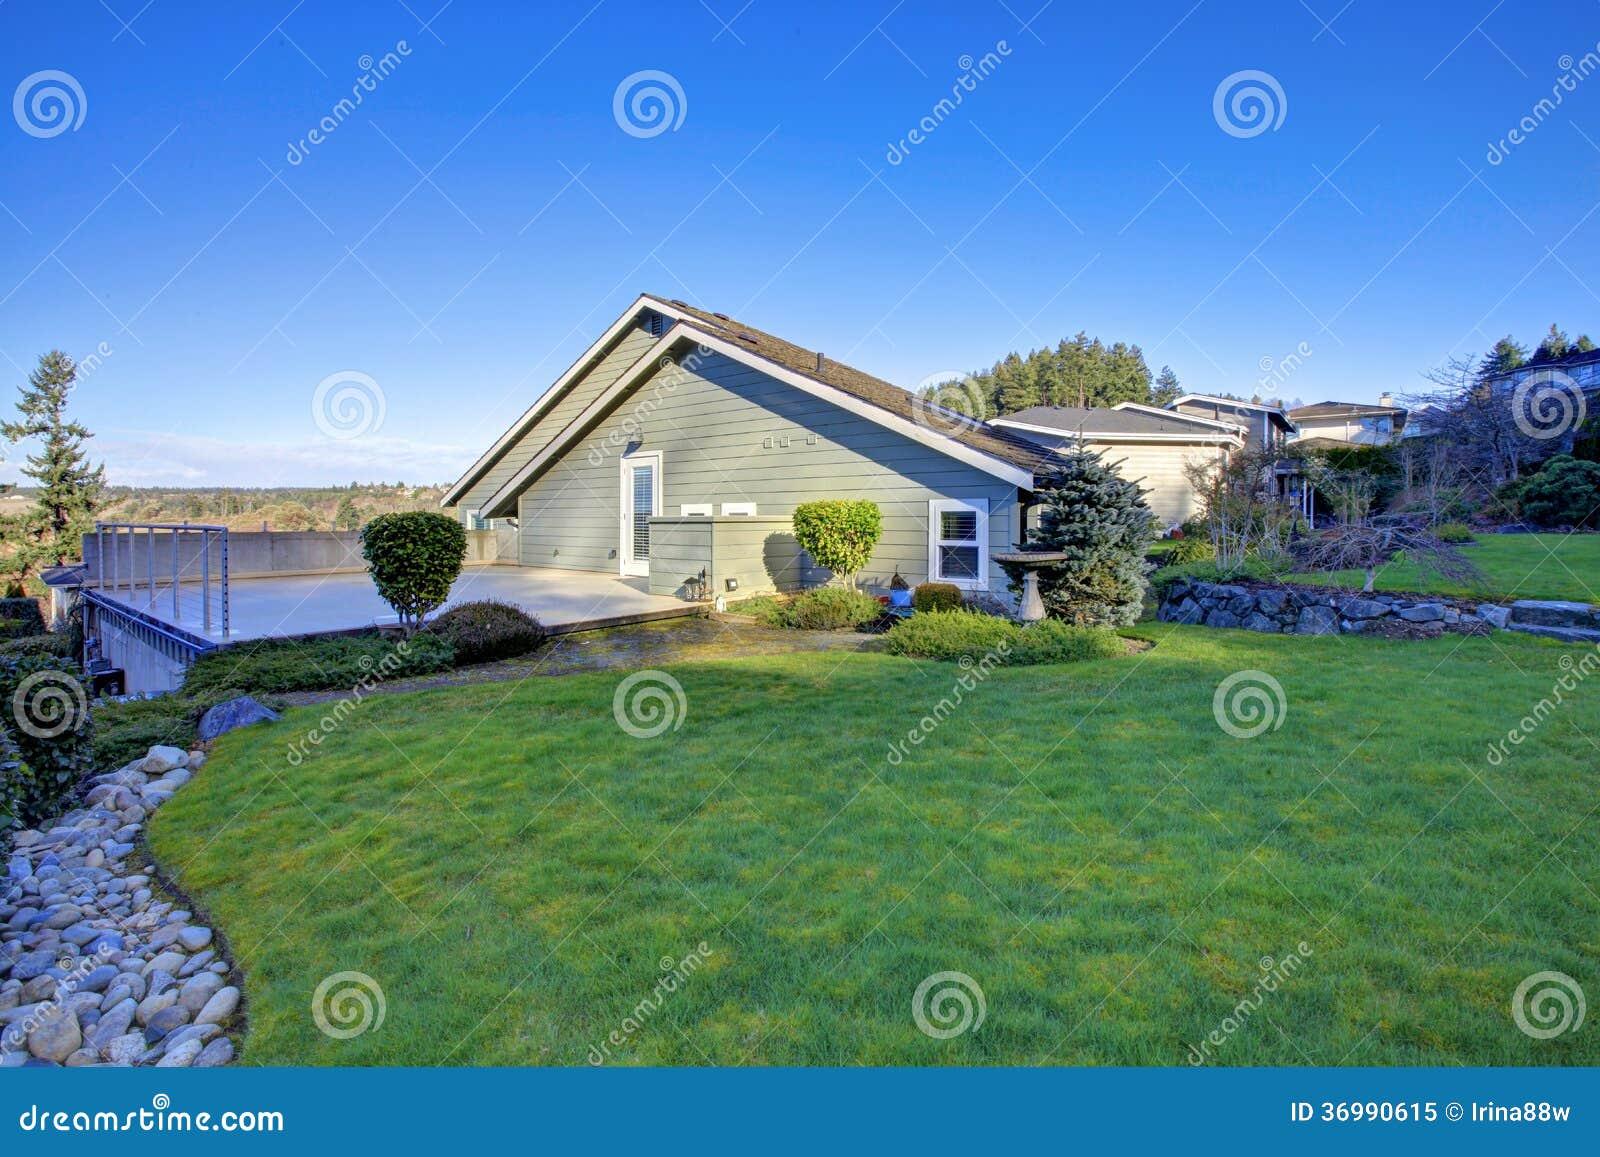 jardim quintal grande:Back Yard Garden with Porch